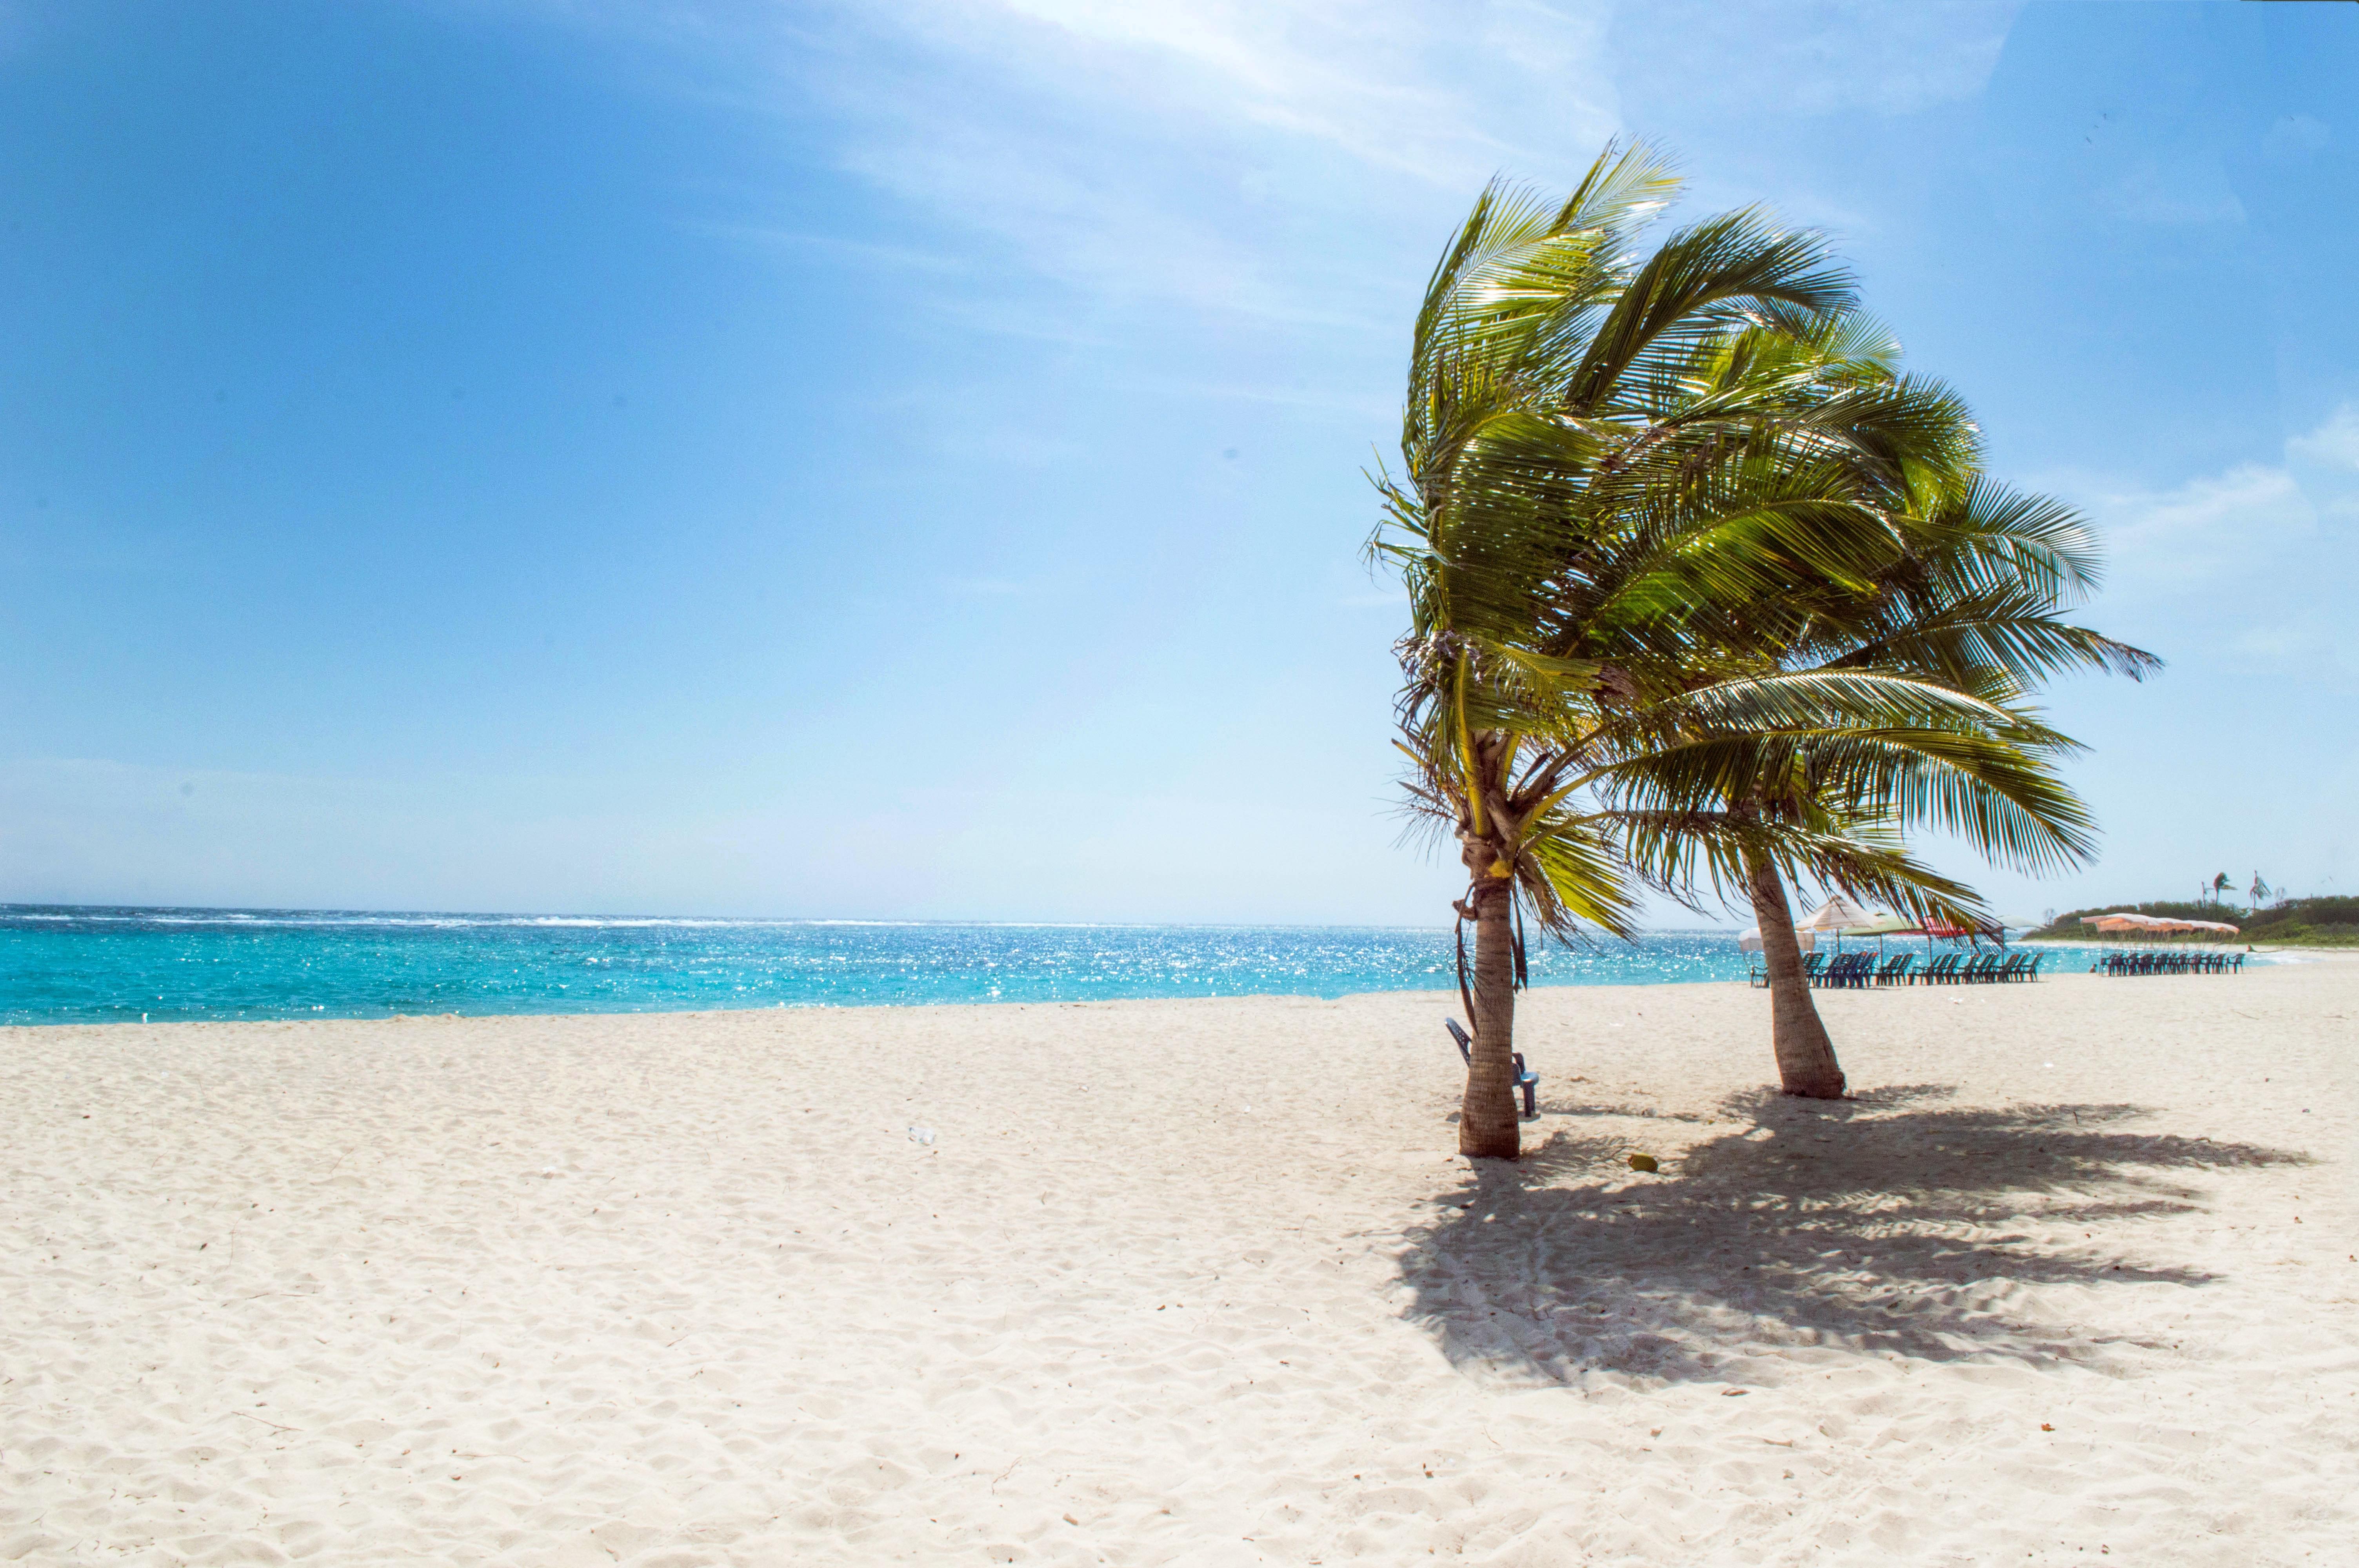 Green Coconut Trees Near Body Of Water 183 Free Stock Photo